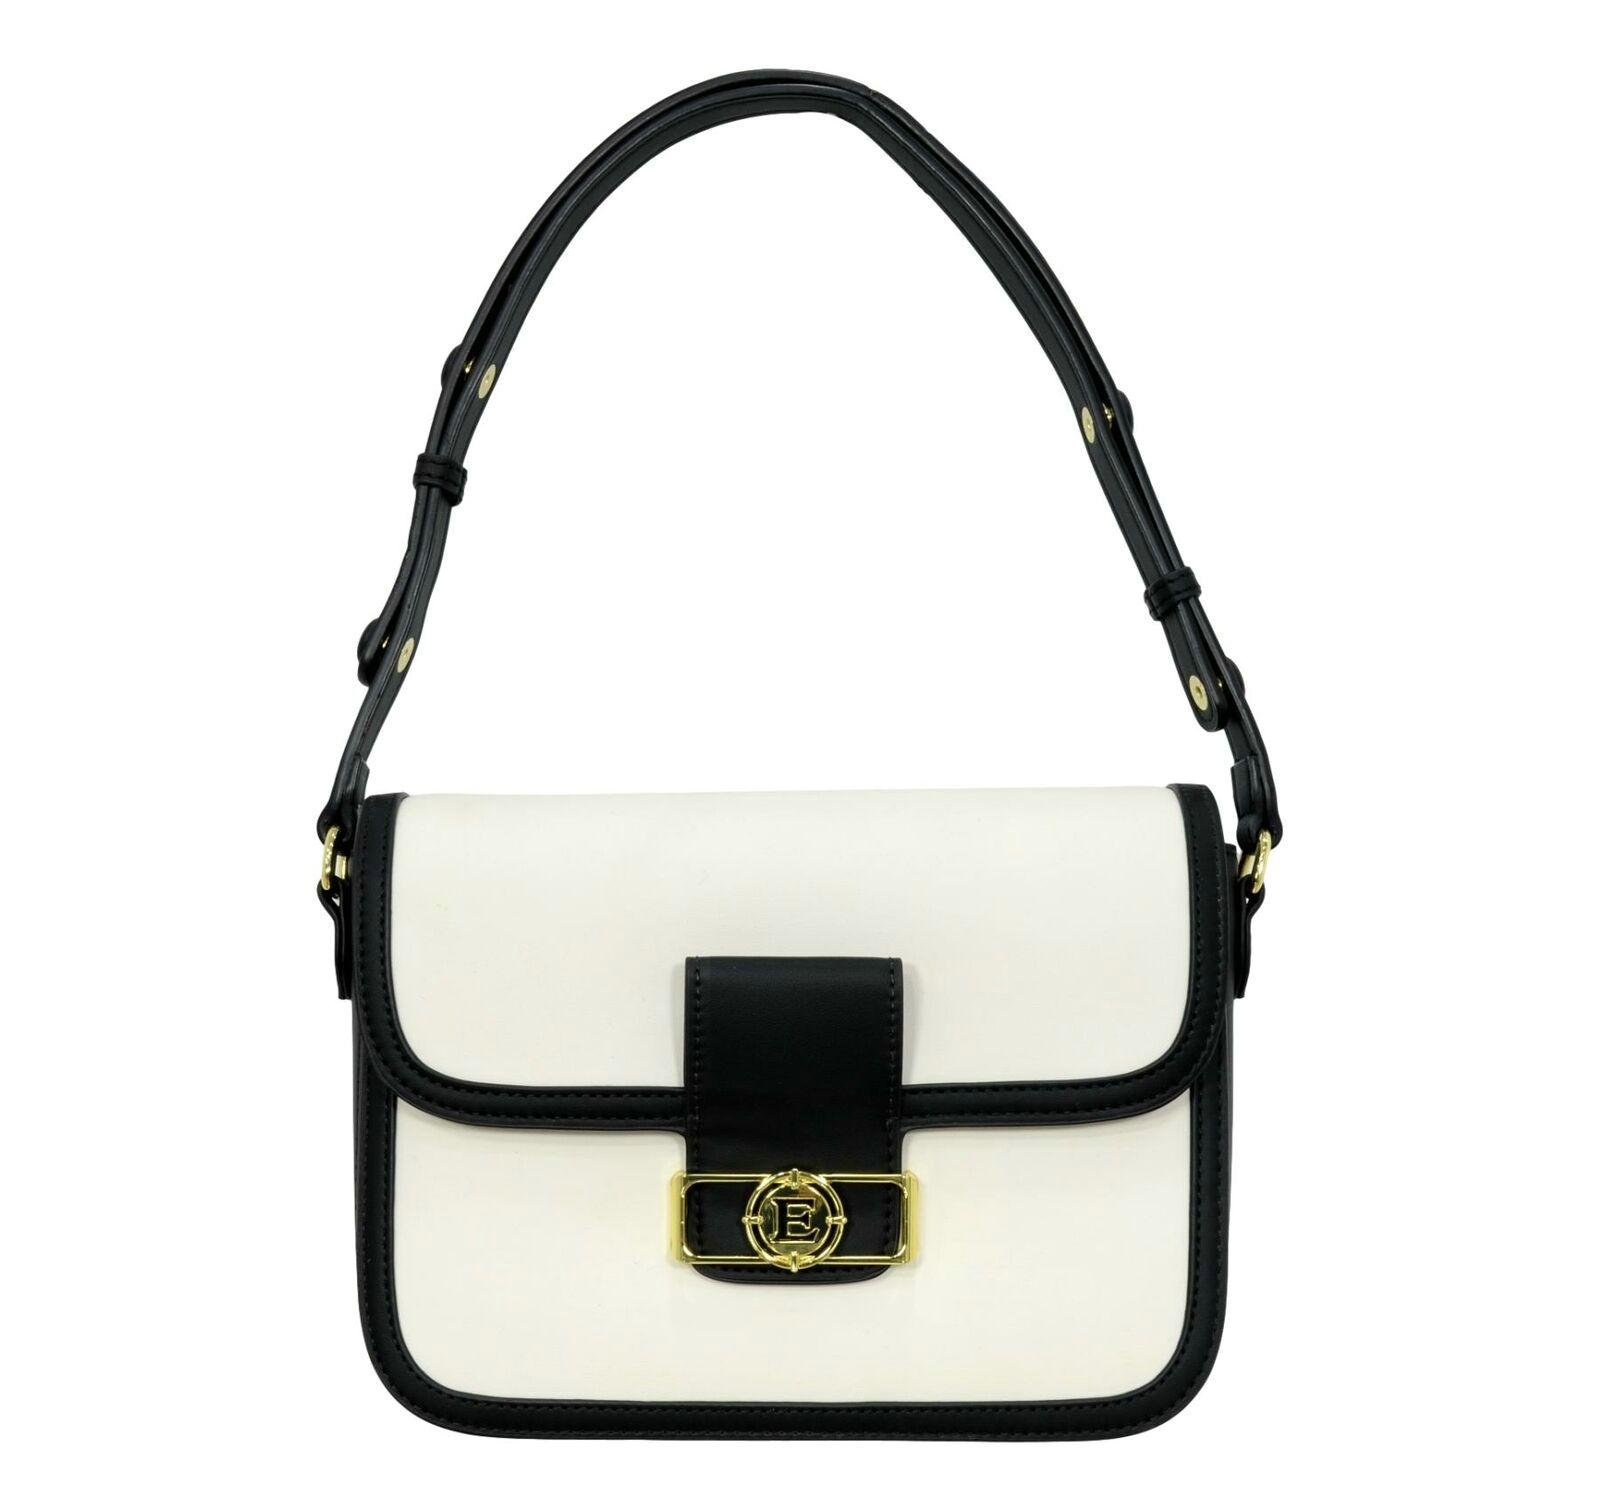 Borsa Ermanno Scervino Medium Flap Bag Joey 12401155 whiteblack